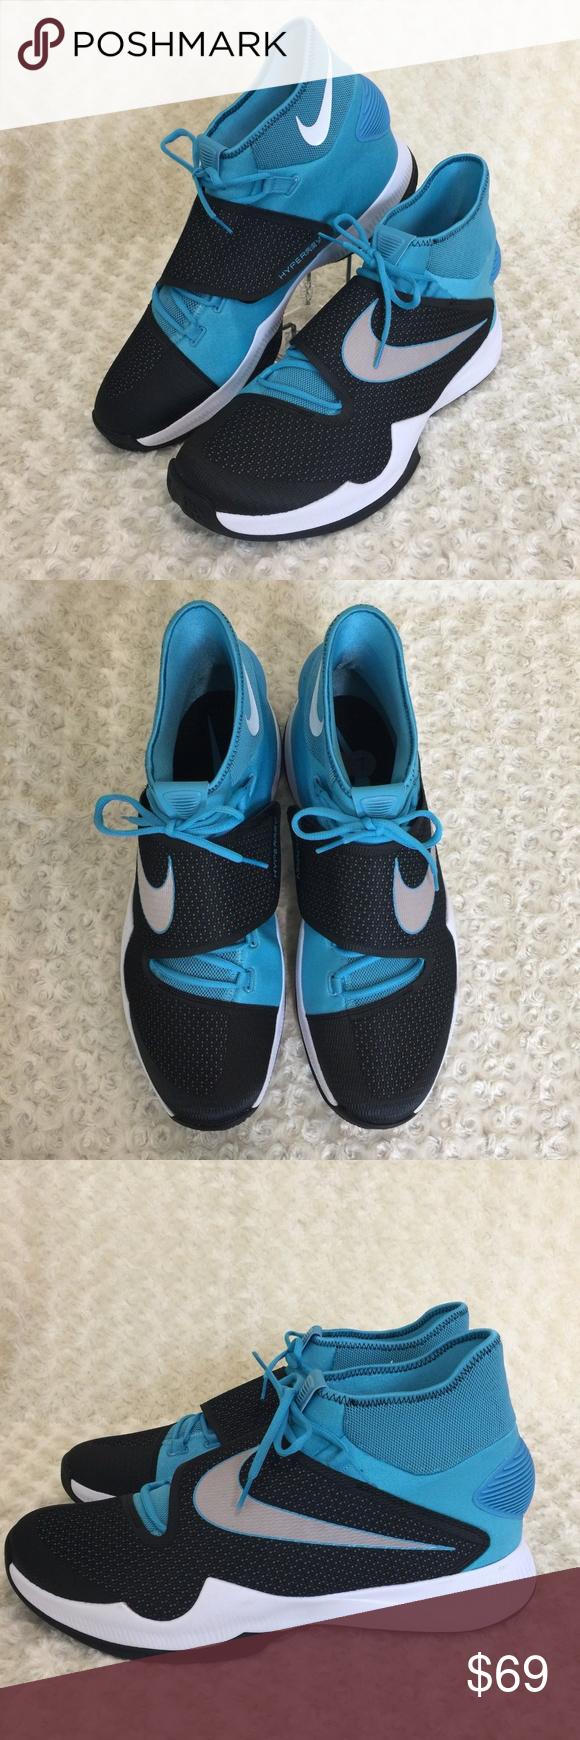 10c4b84cdddf Nike Zoom Hyperrev 2016 Athletic Basketball Shoes Nike Zoom Hyperrev 2016  Size 17 US Athletic Basketball